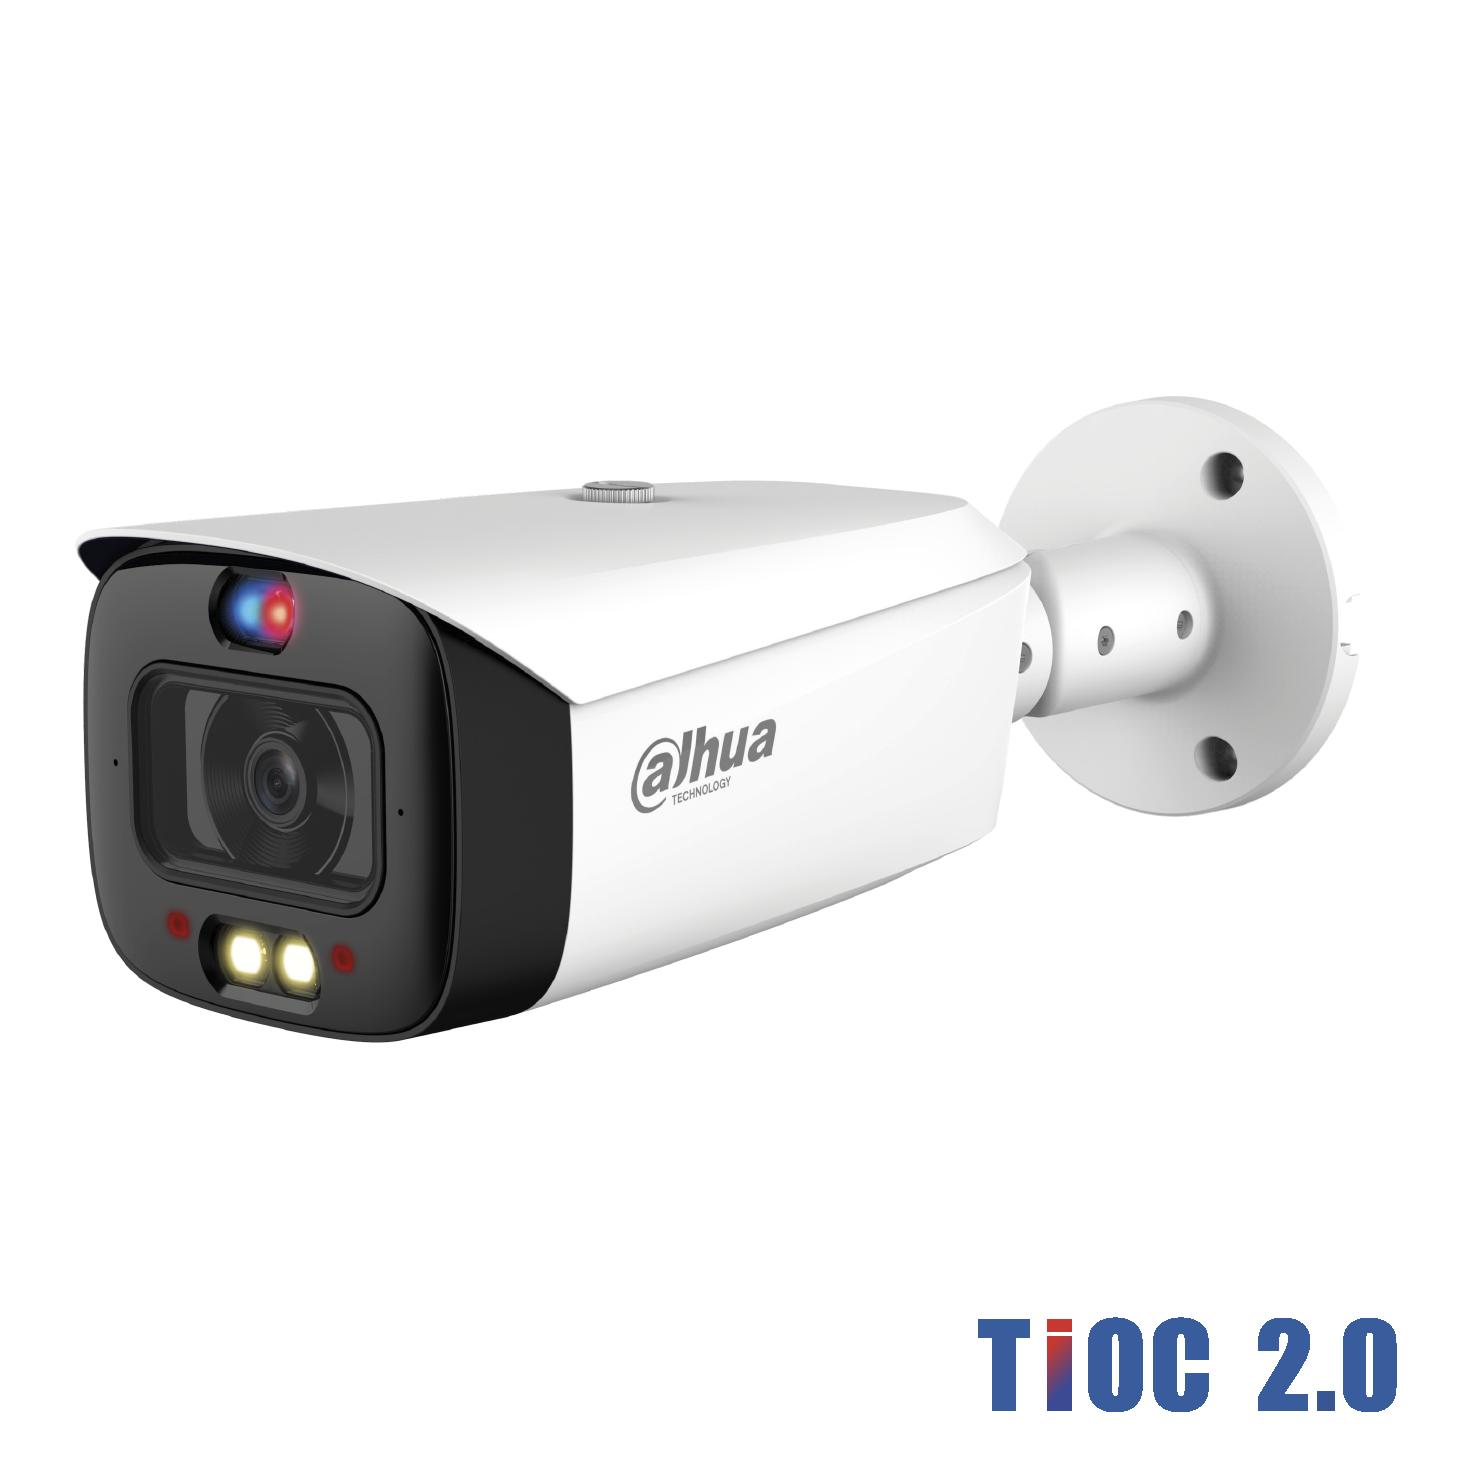 Dahua IP 8MP TiOC 2.0 IR & LED Bullet 3.6mm Dual Illumination 30mtr